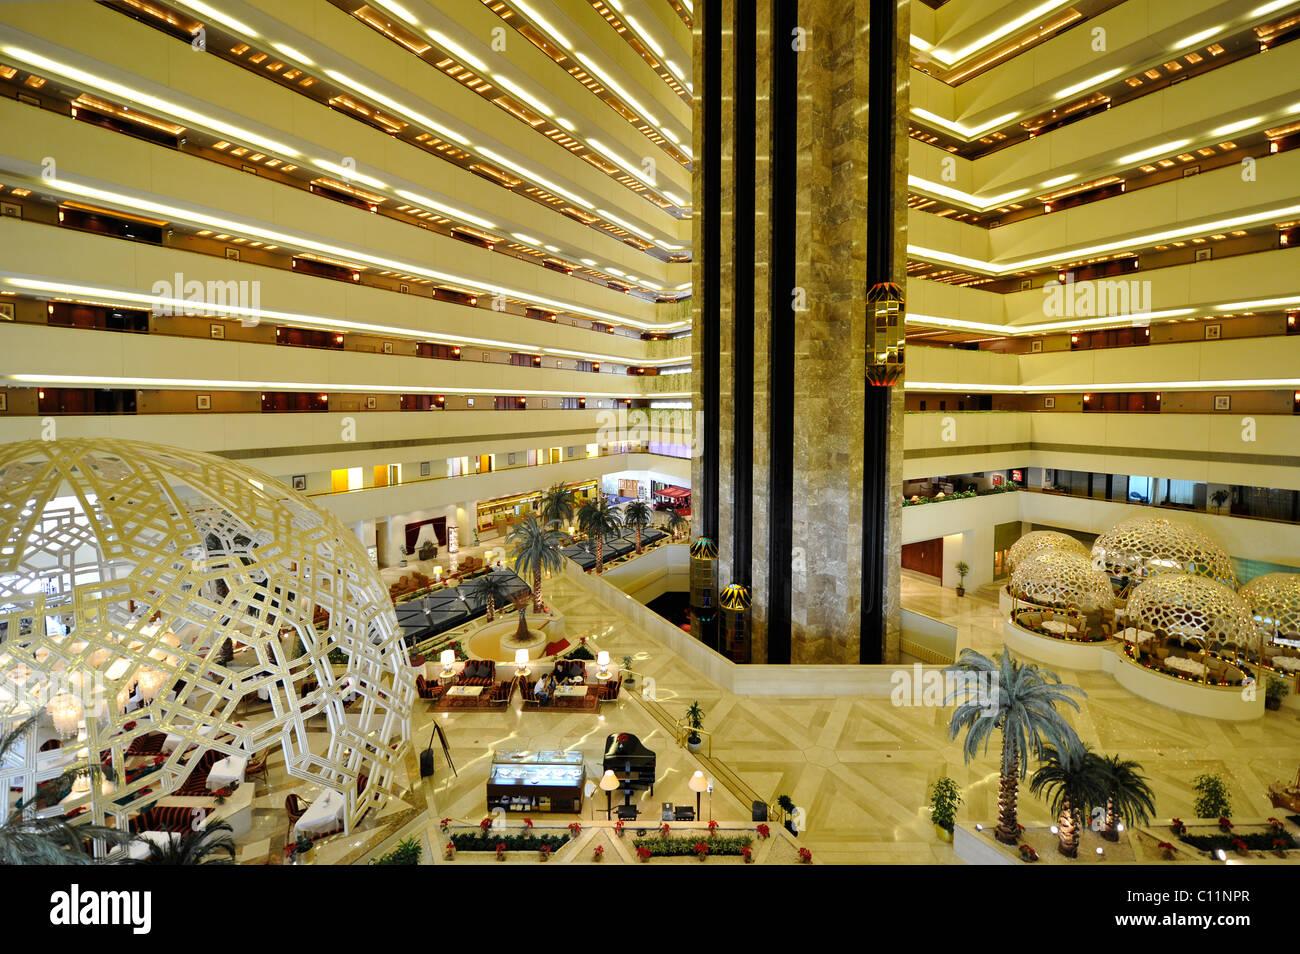 Interior, ascensores, Hotel Sheraton Doha, Doha, Qatar, el Golfo Pérsico, Oriente Medio, Asia Imagen De Stock